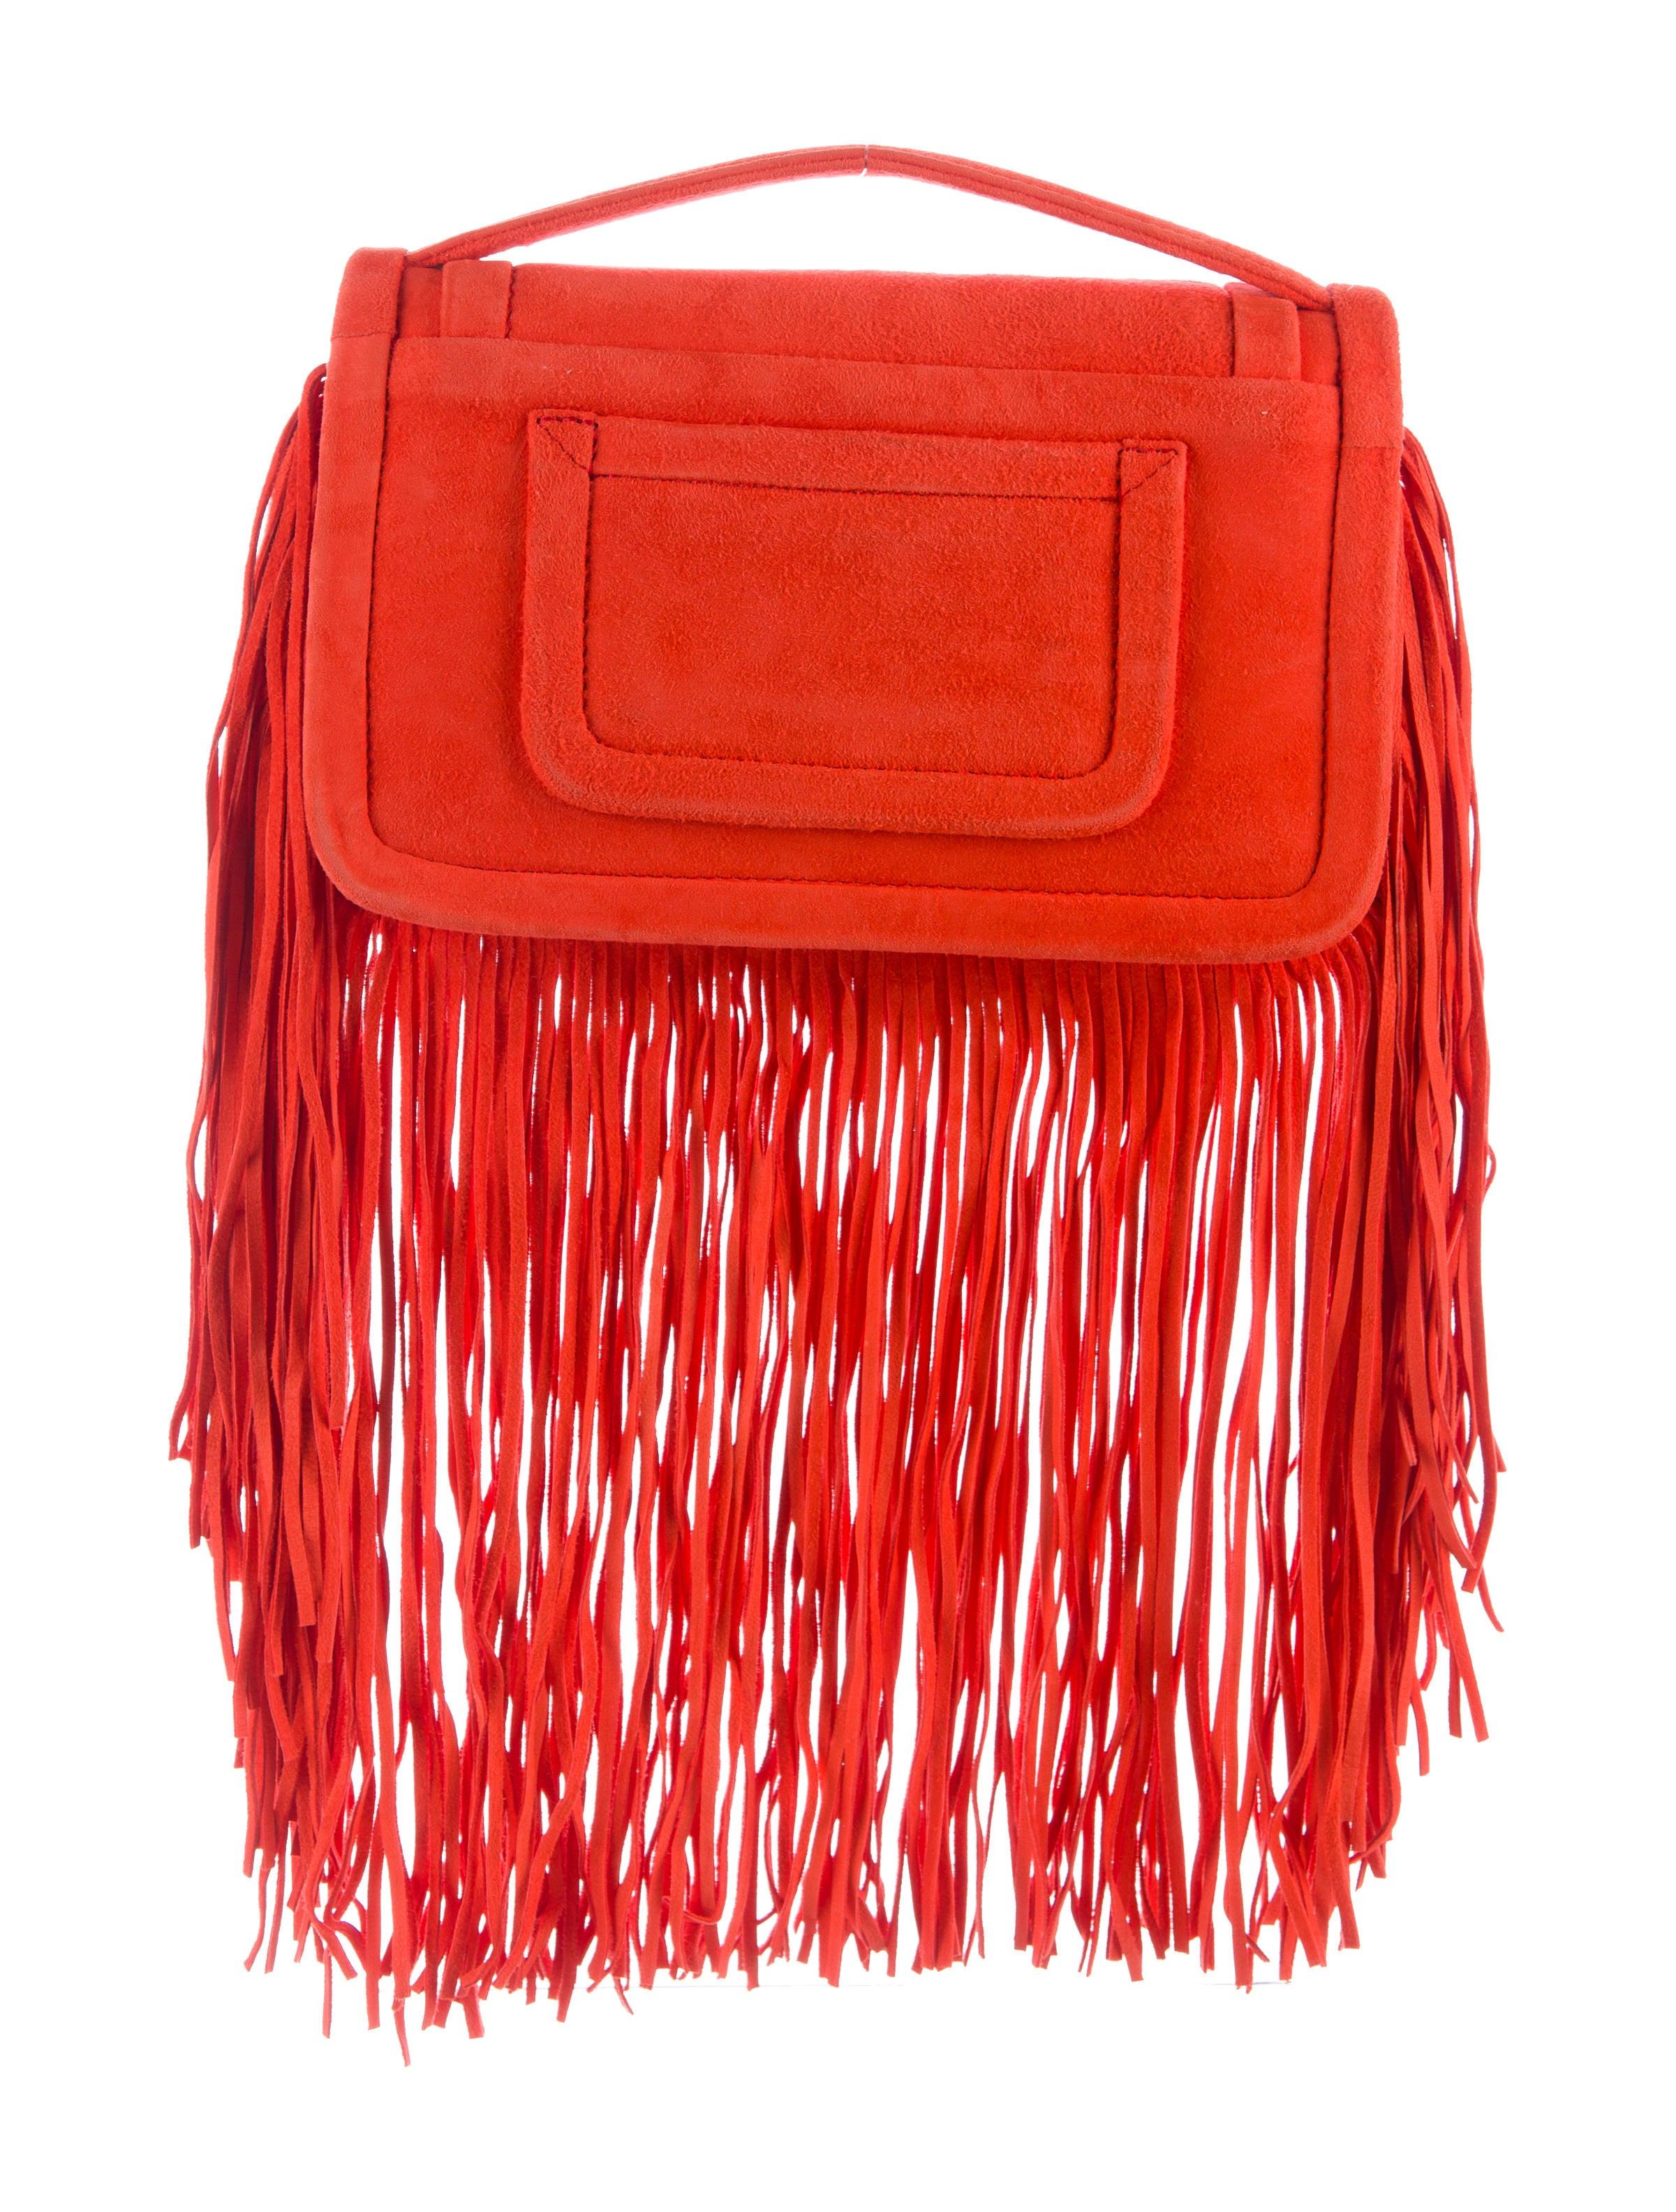 hardy fringe crossbody bag handbags pie24204